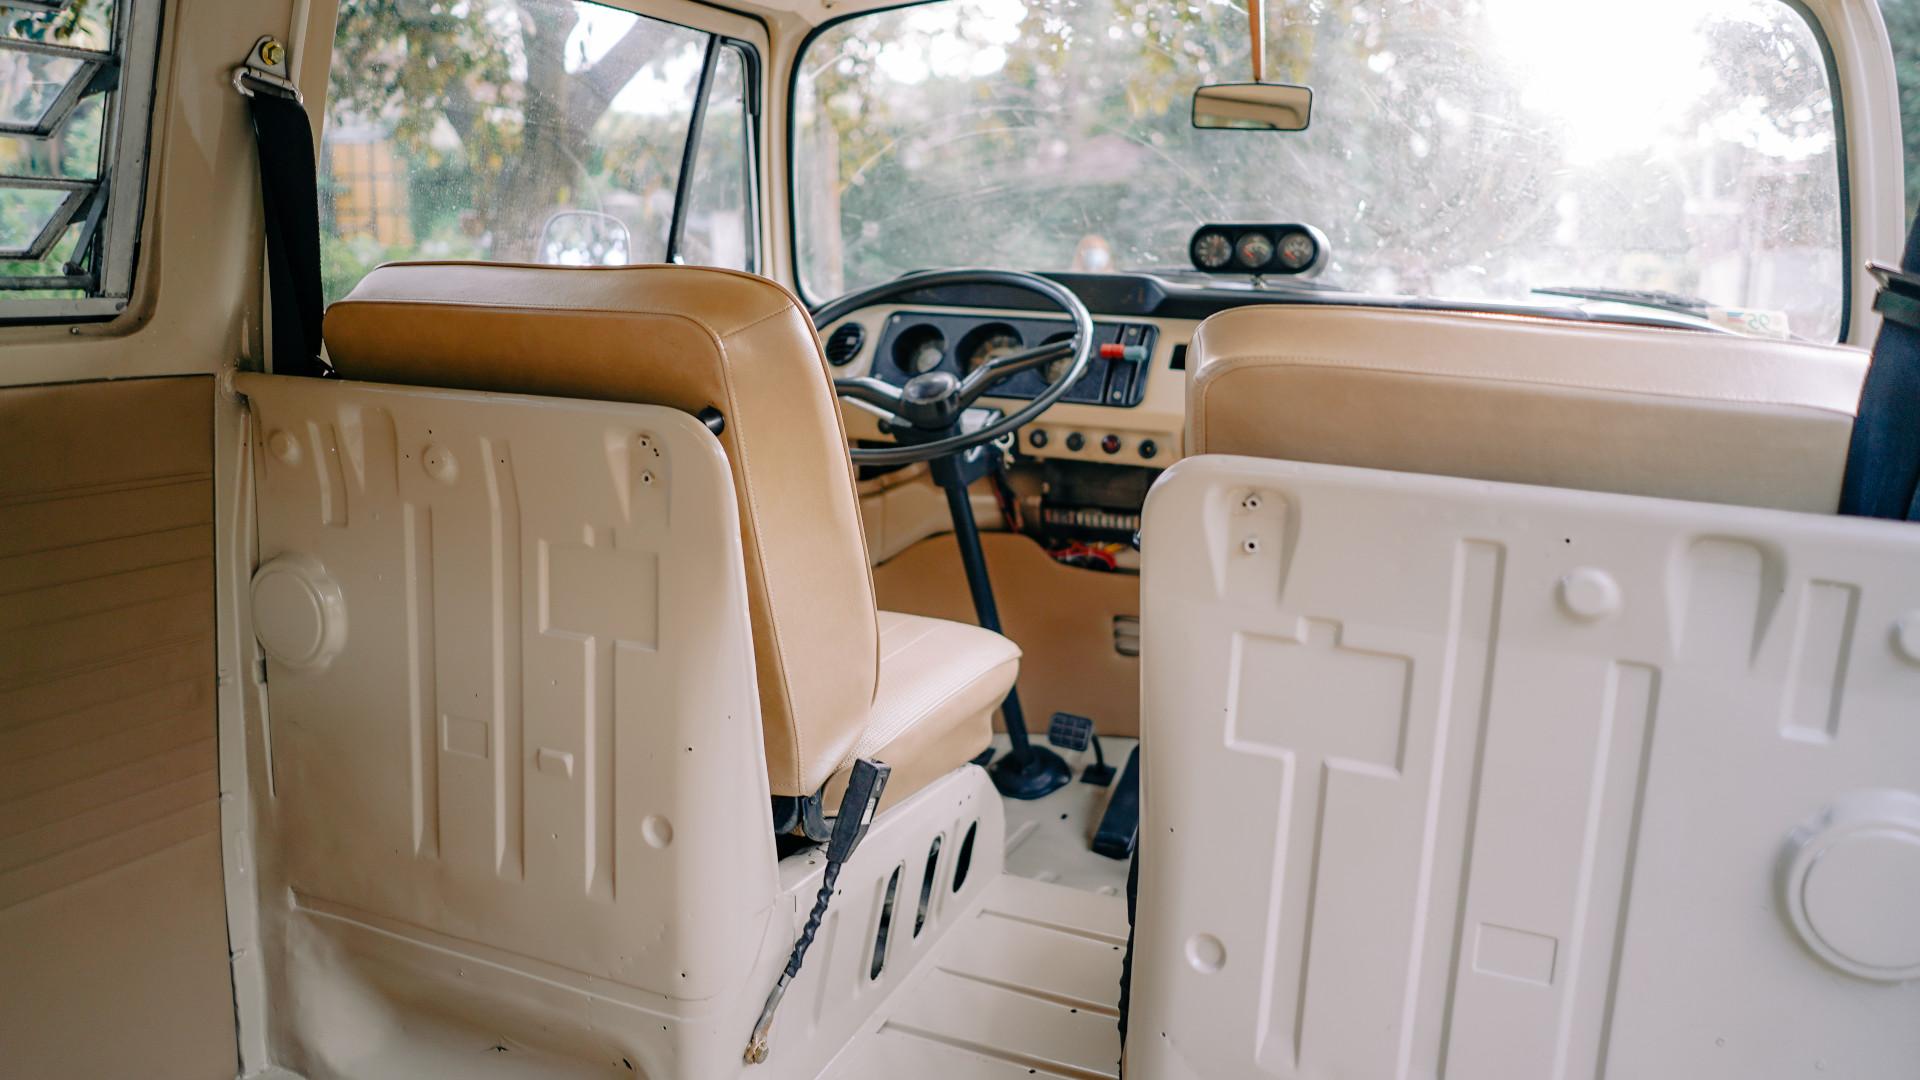 Volkswagen Type 2 front passenger seats rear POV